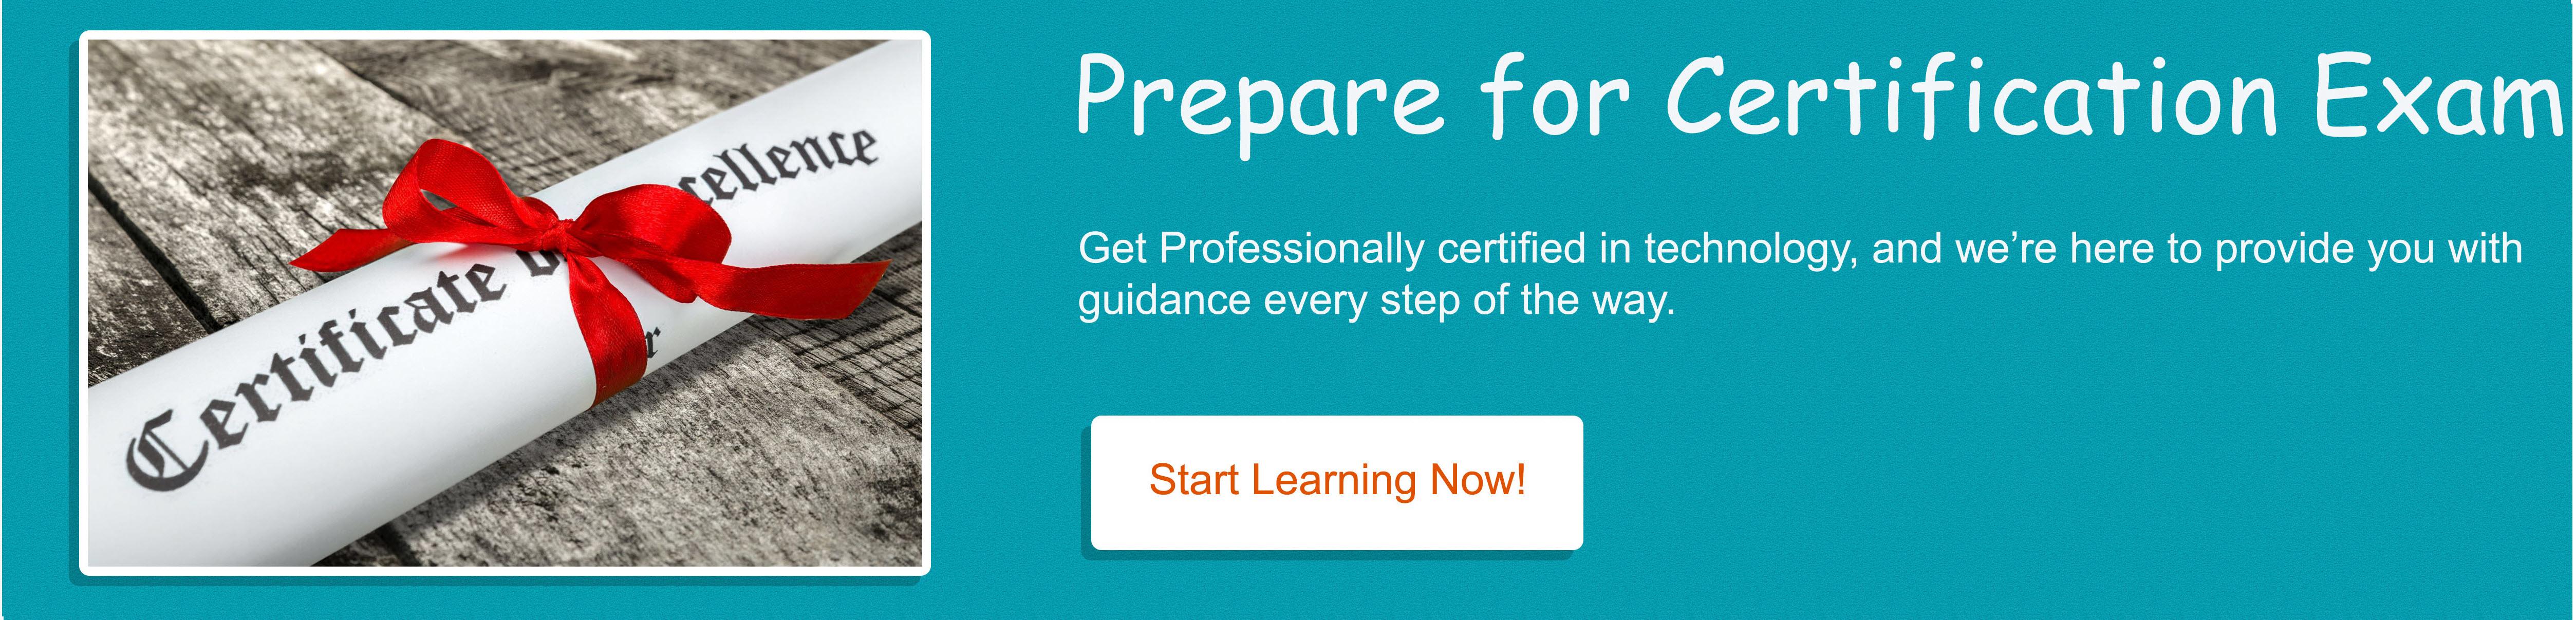 Prepare for Certification Exam